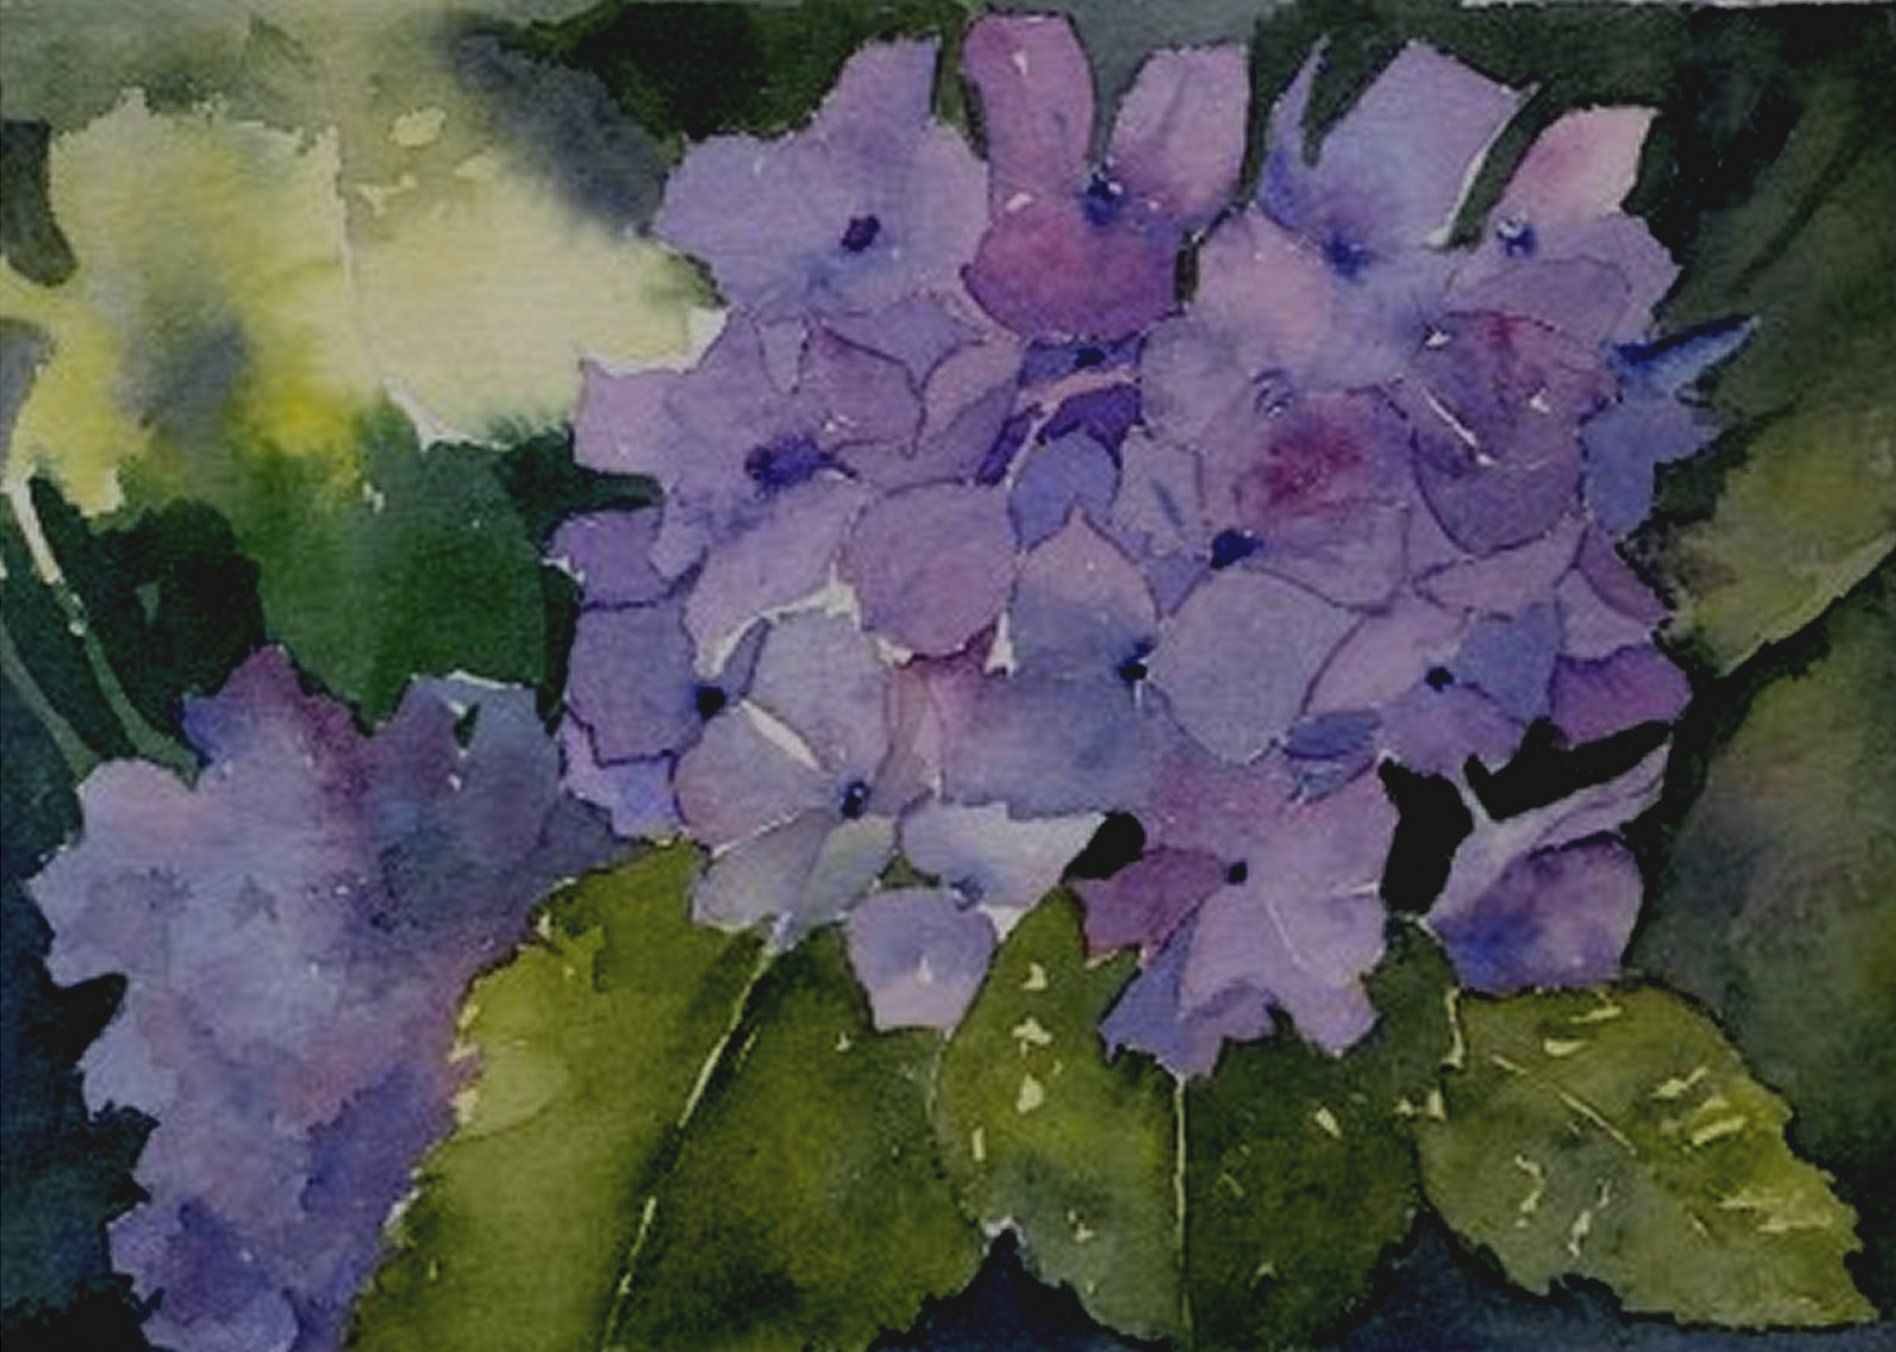 Floral Watercolor Paintings - Bing Images